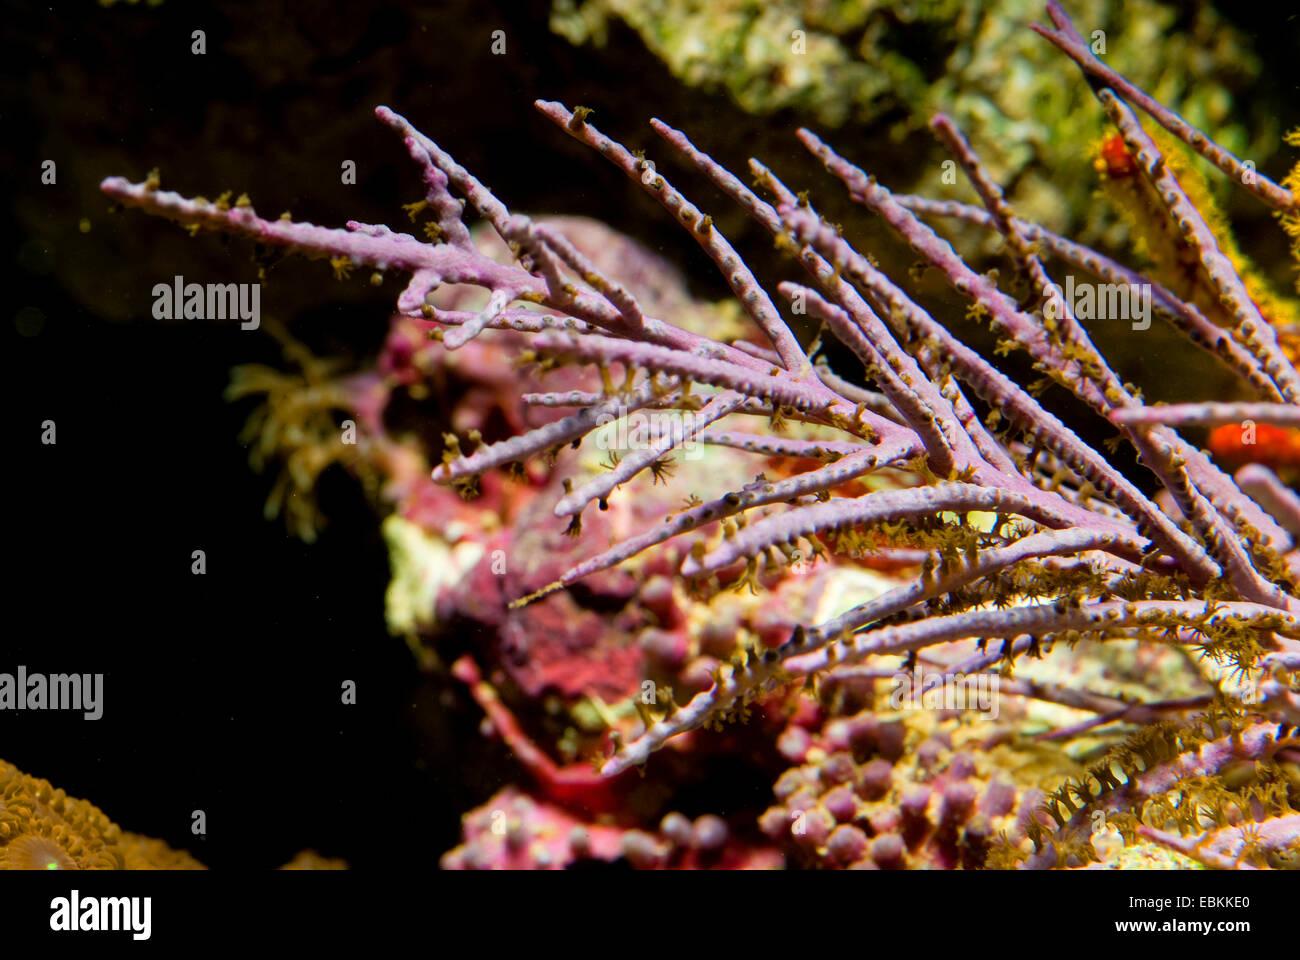 Plume (la mer Pseudopterogorgia spec.,), close-up view Photo Stock